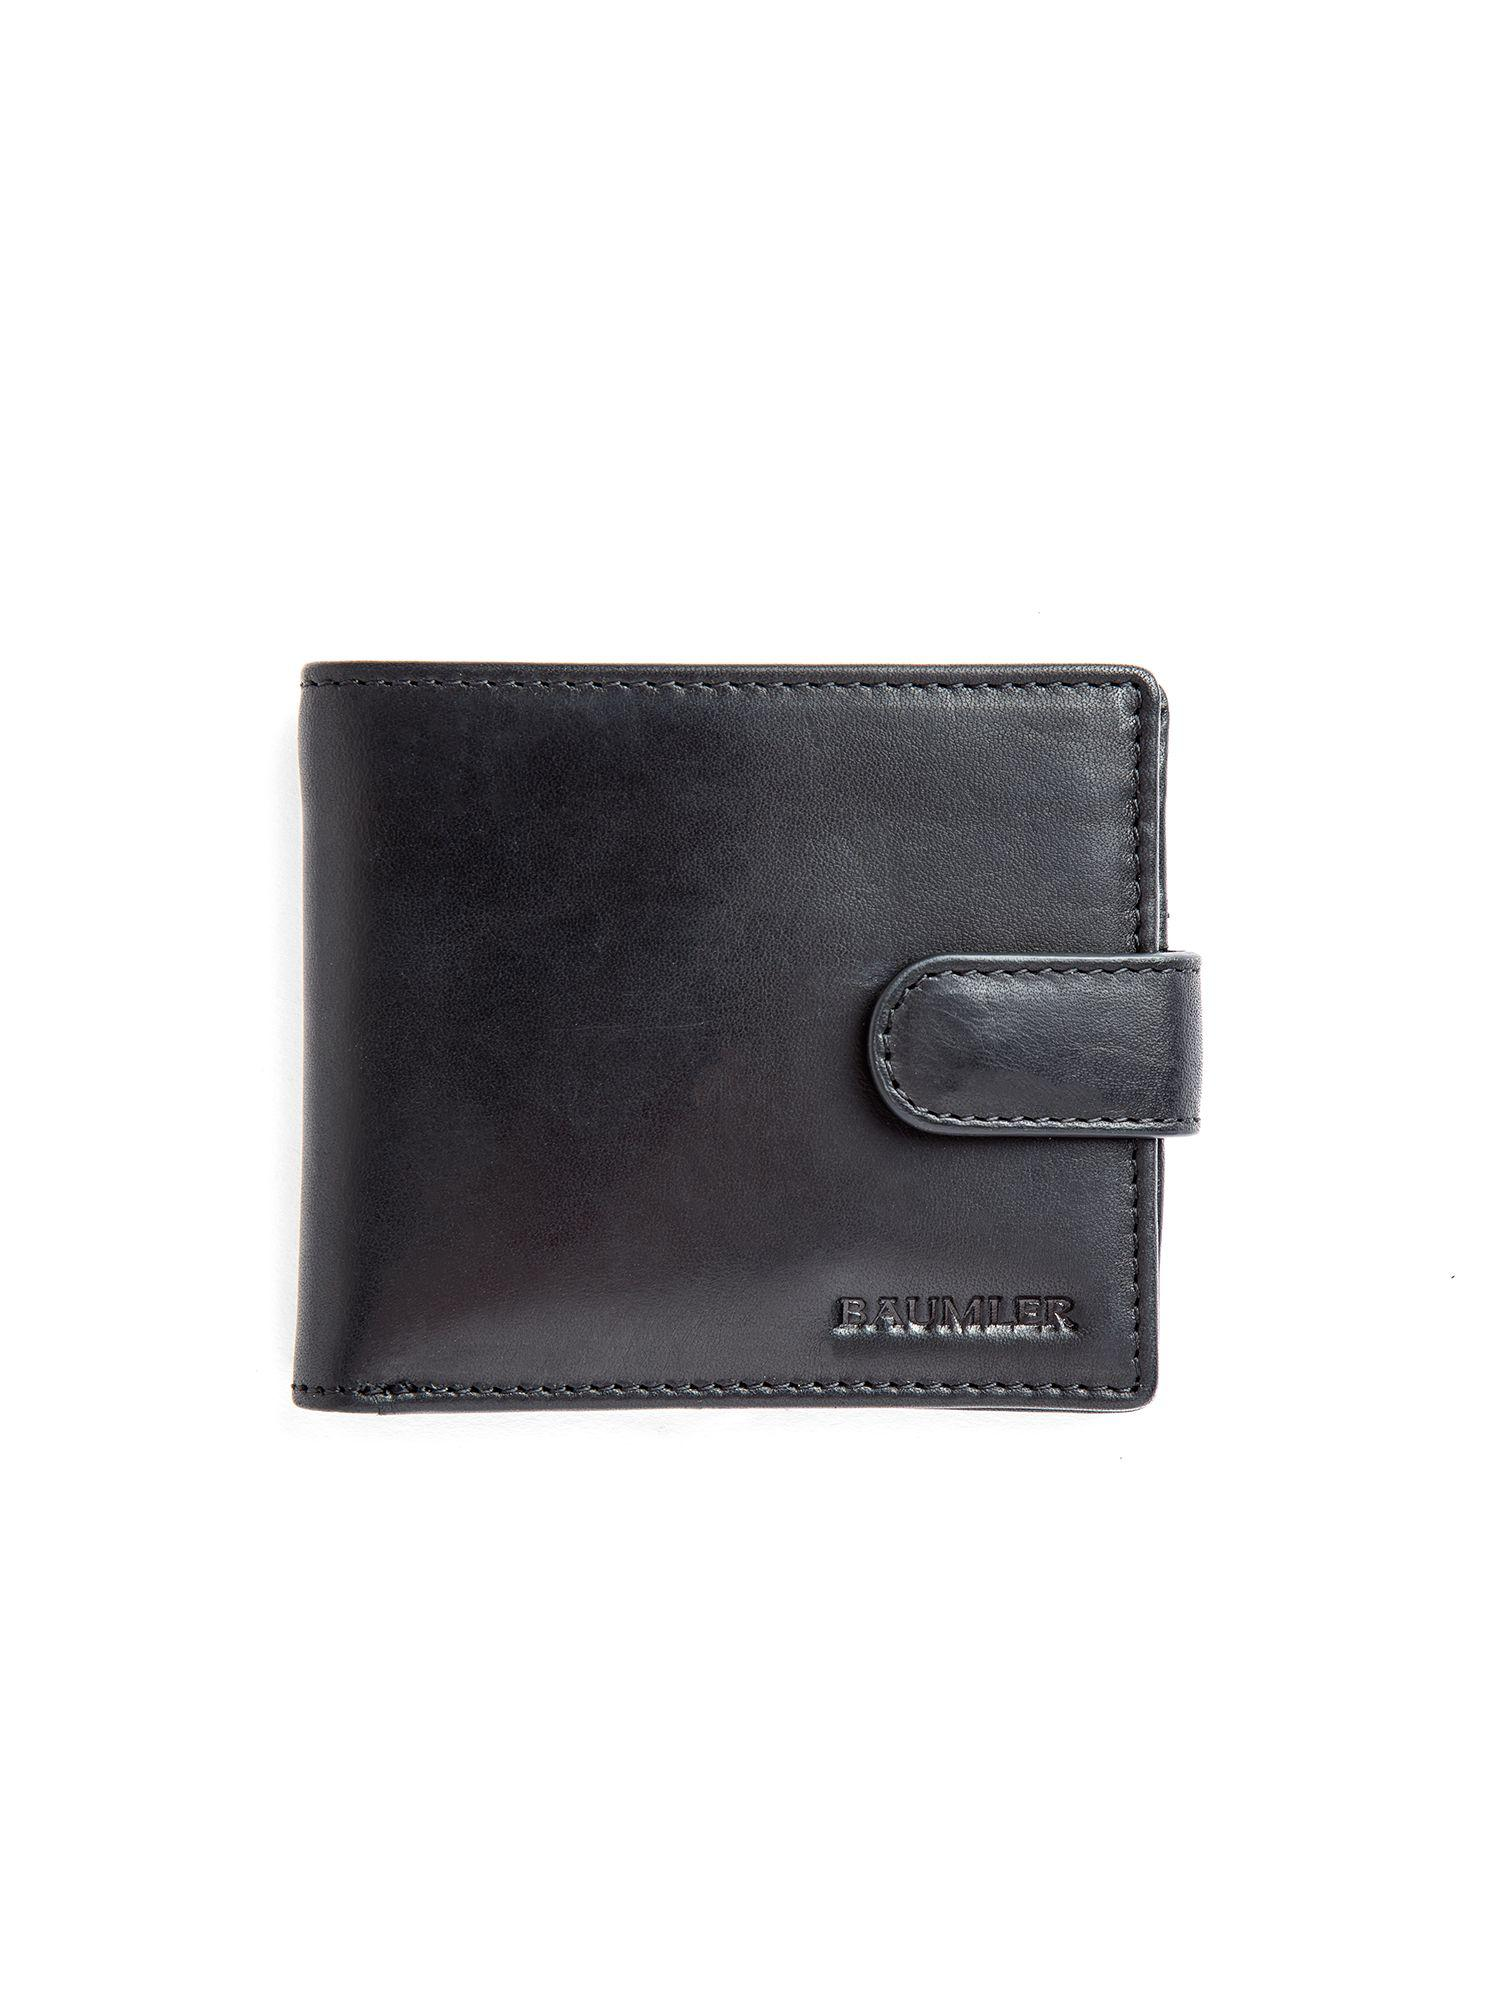 3988ac1d63 Bäumler Munich Leather Cufflink Box in Brown for Men - Lyst